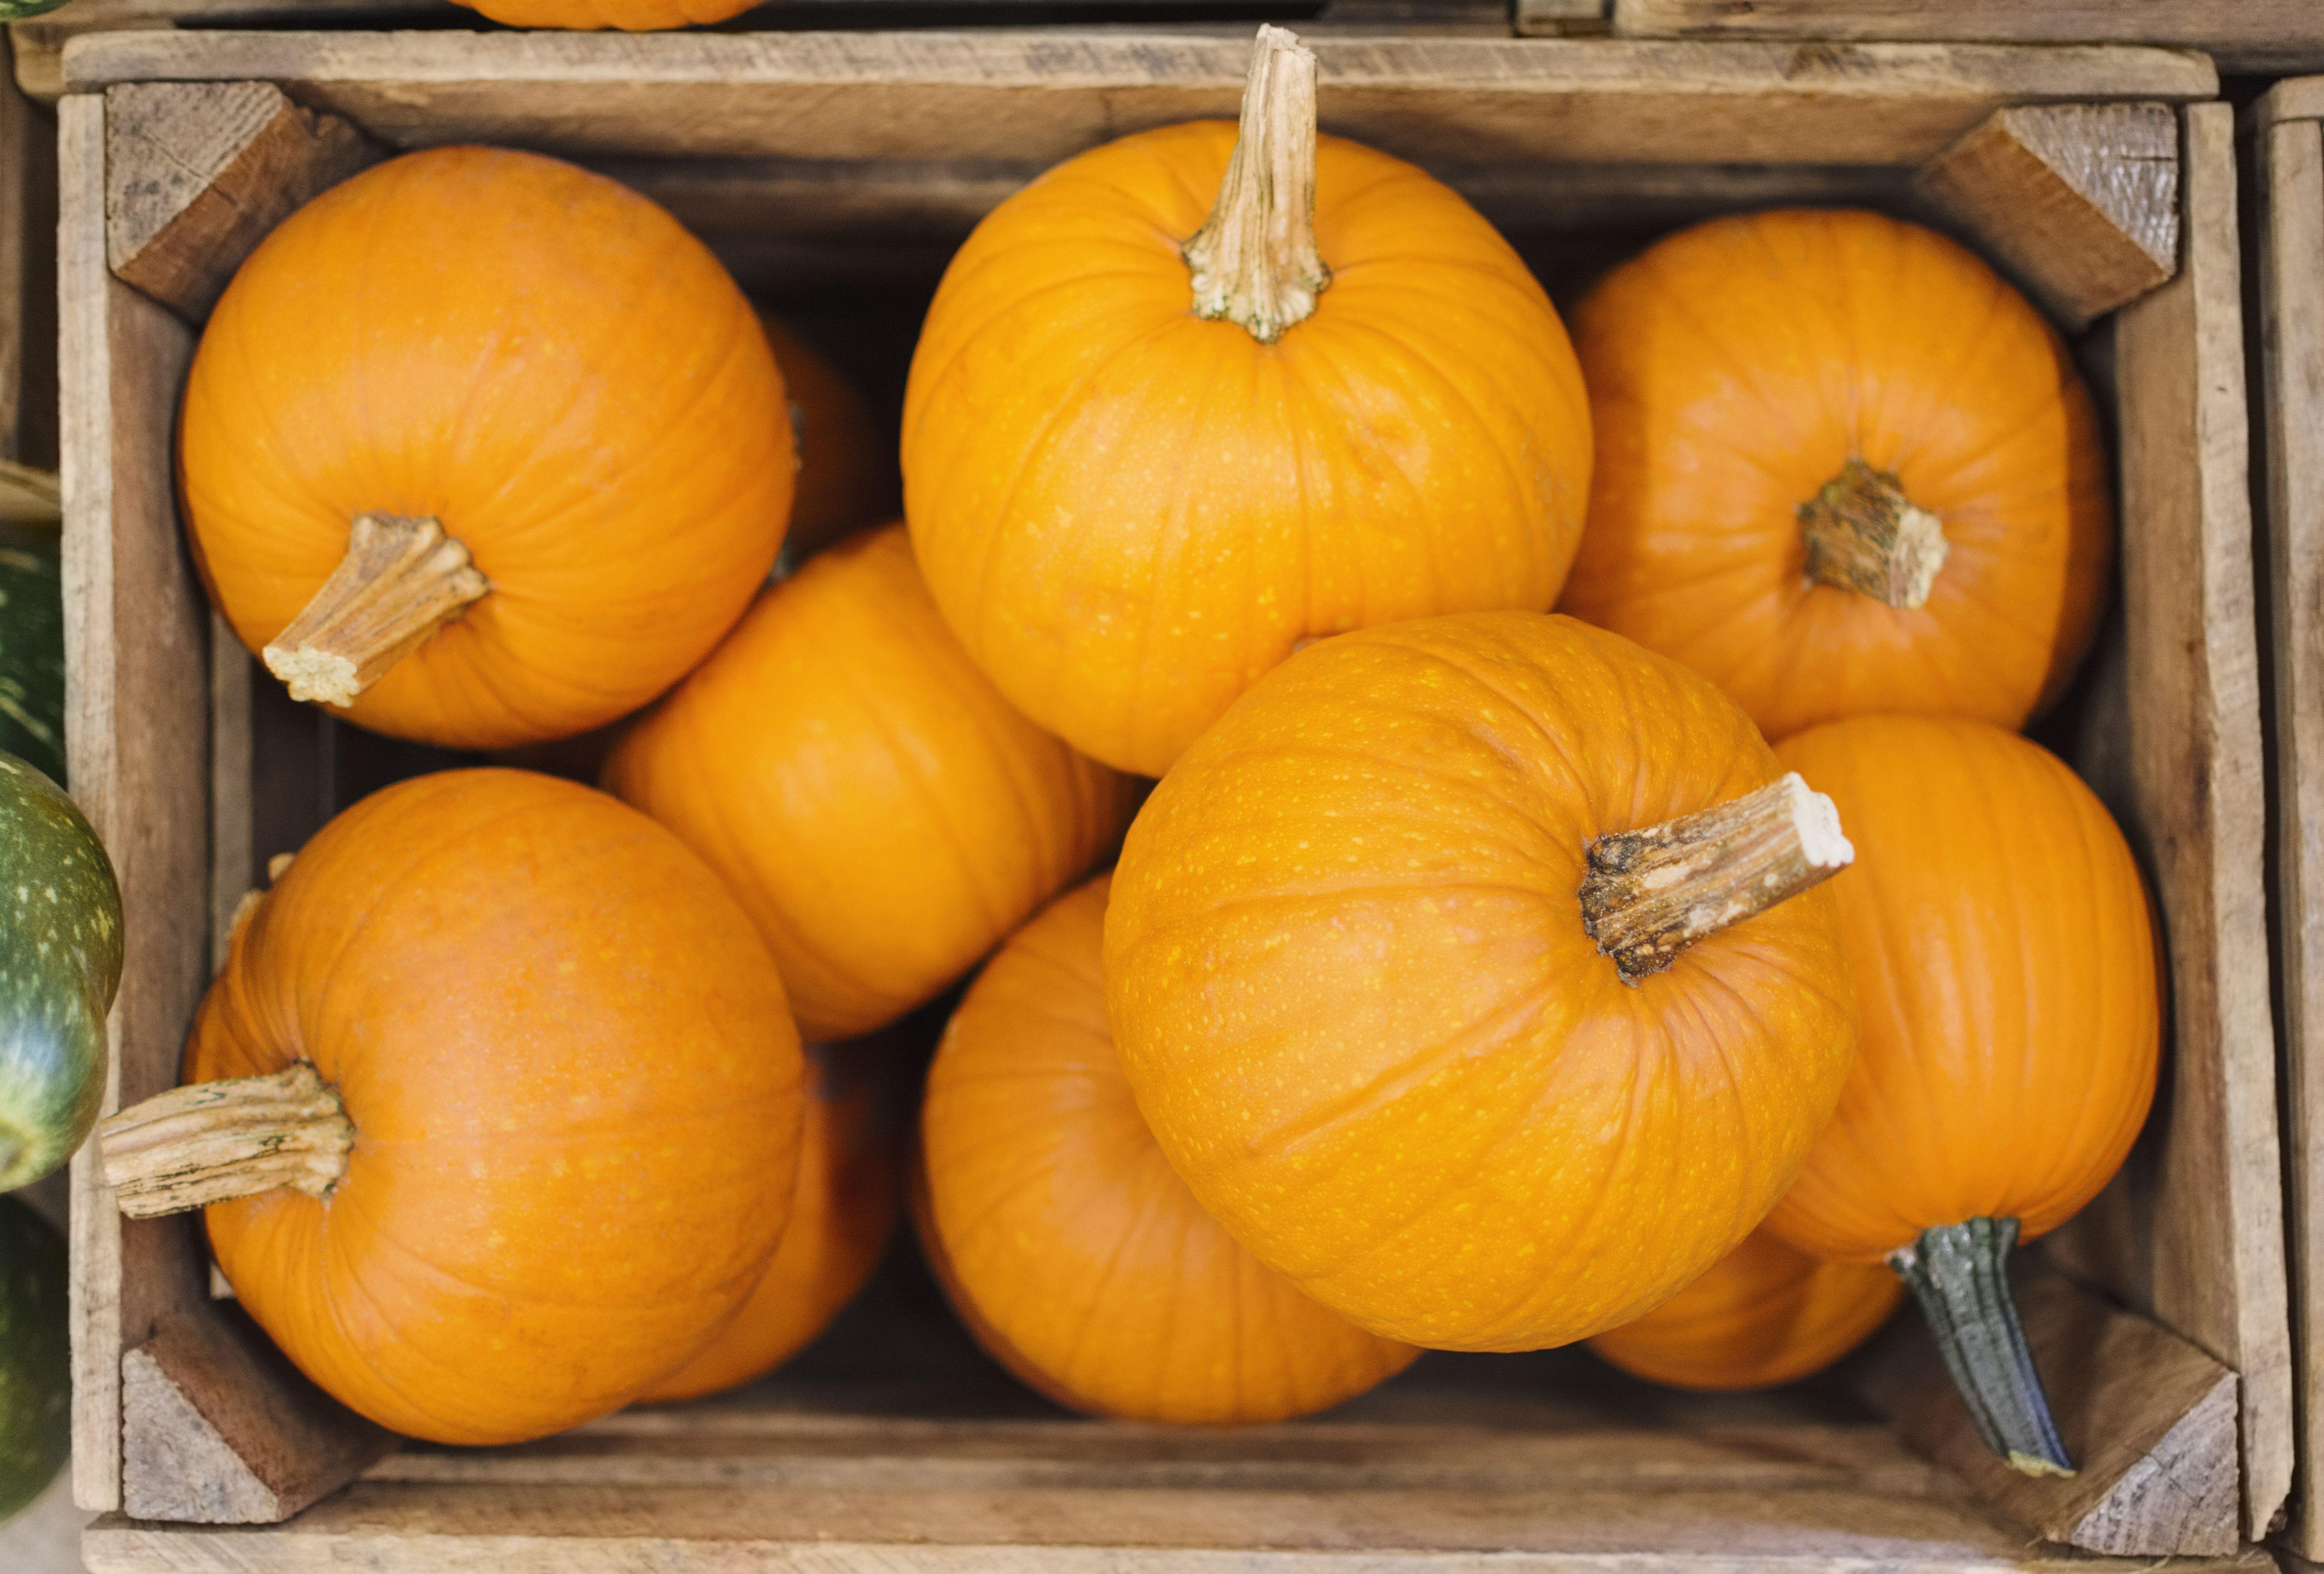 Pumpkins in box